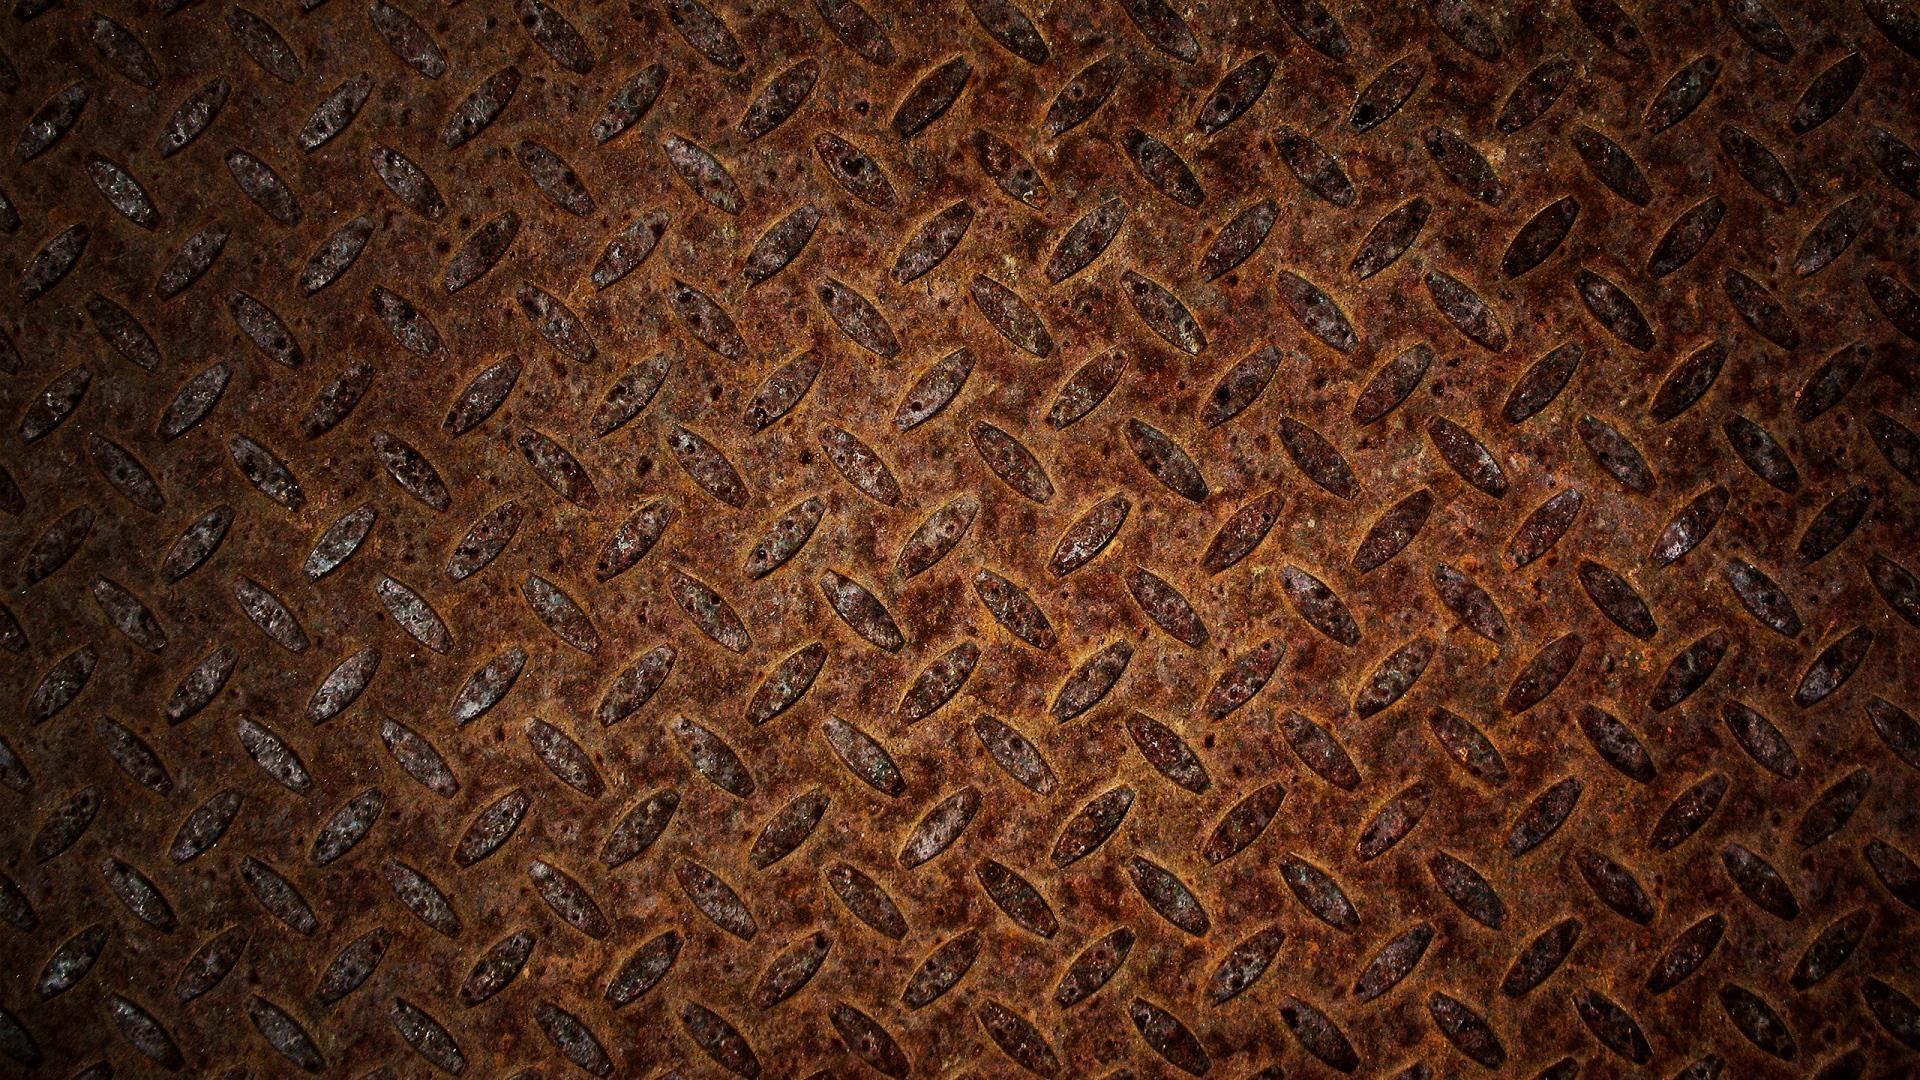 Rust & Blue Grey Background Stock Images - Image: 2334584